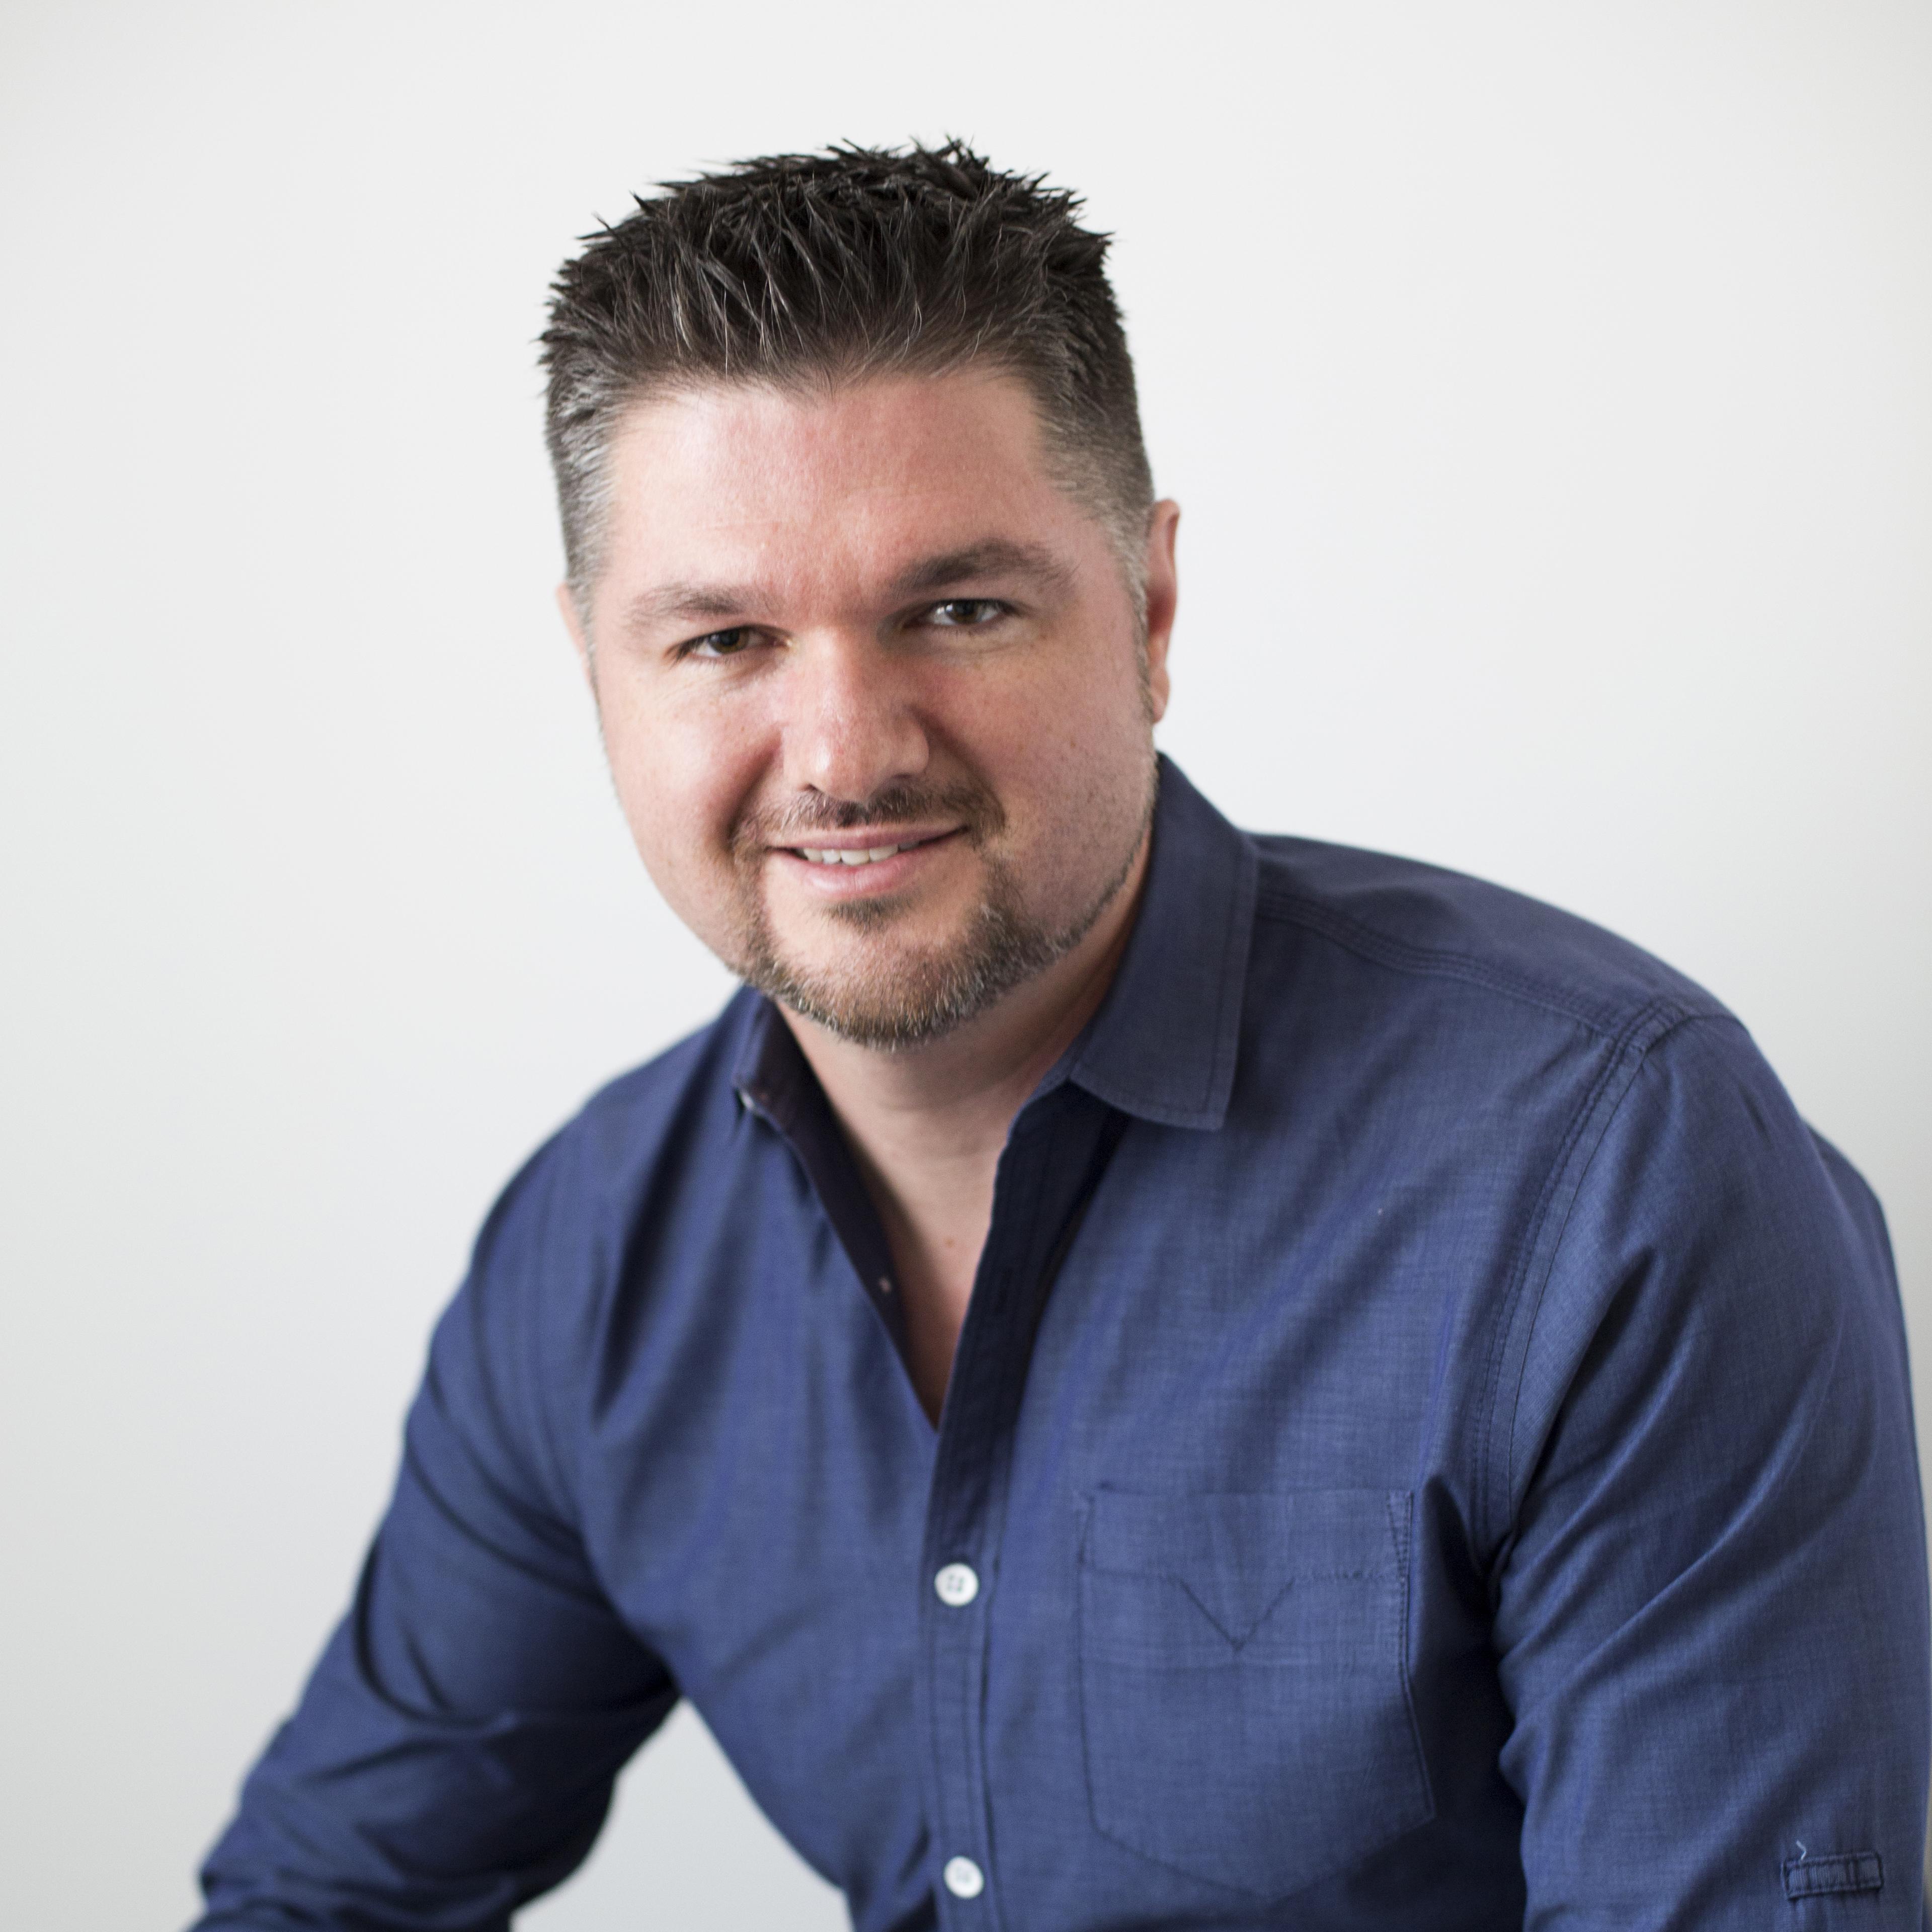 Shaun Buck - CEO at Newsletter Pro